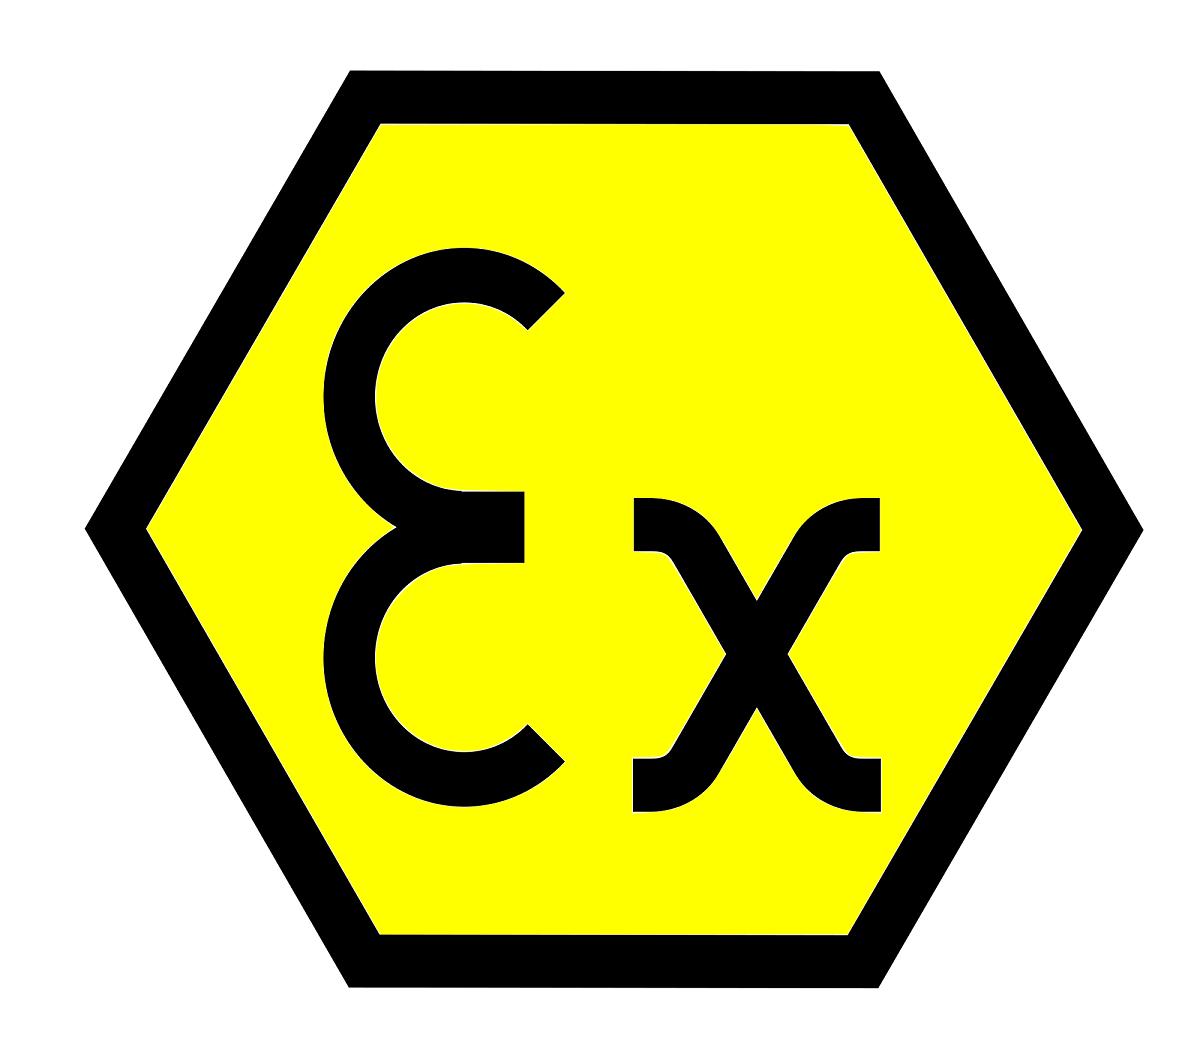 weintek HMI Mt8150XE ATEX anti explosion certified